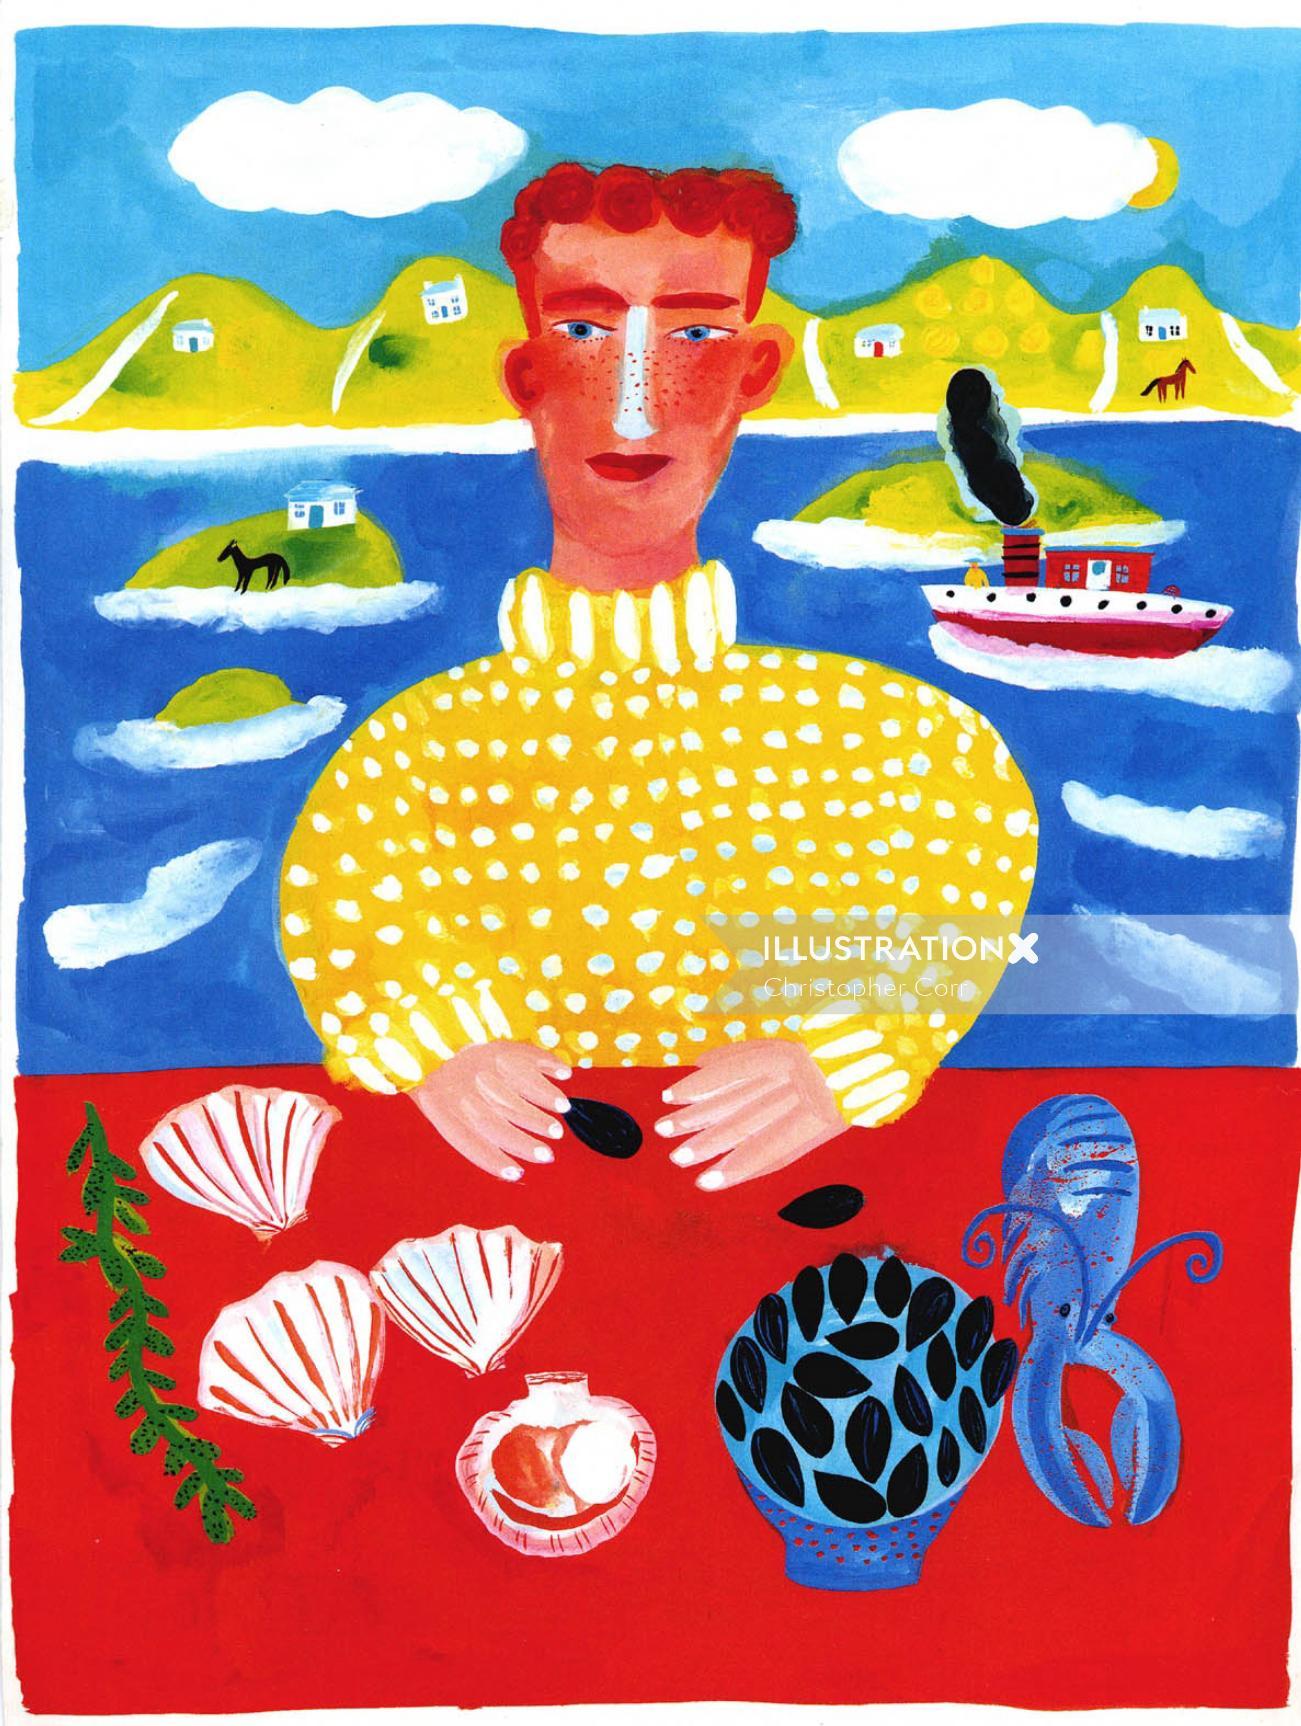 Colored fisherman illustration